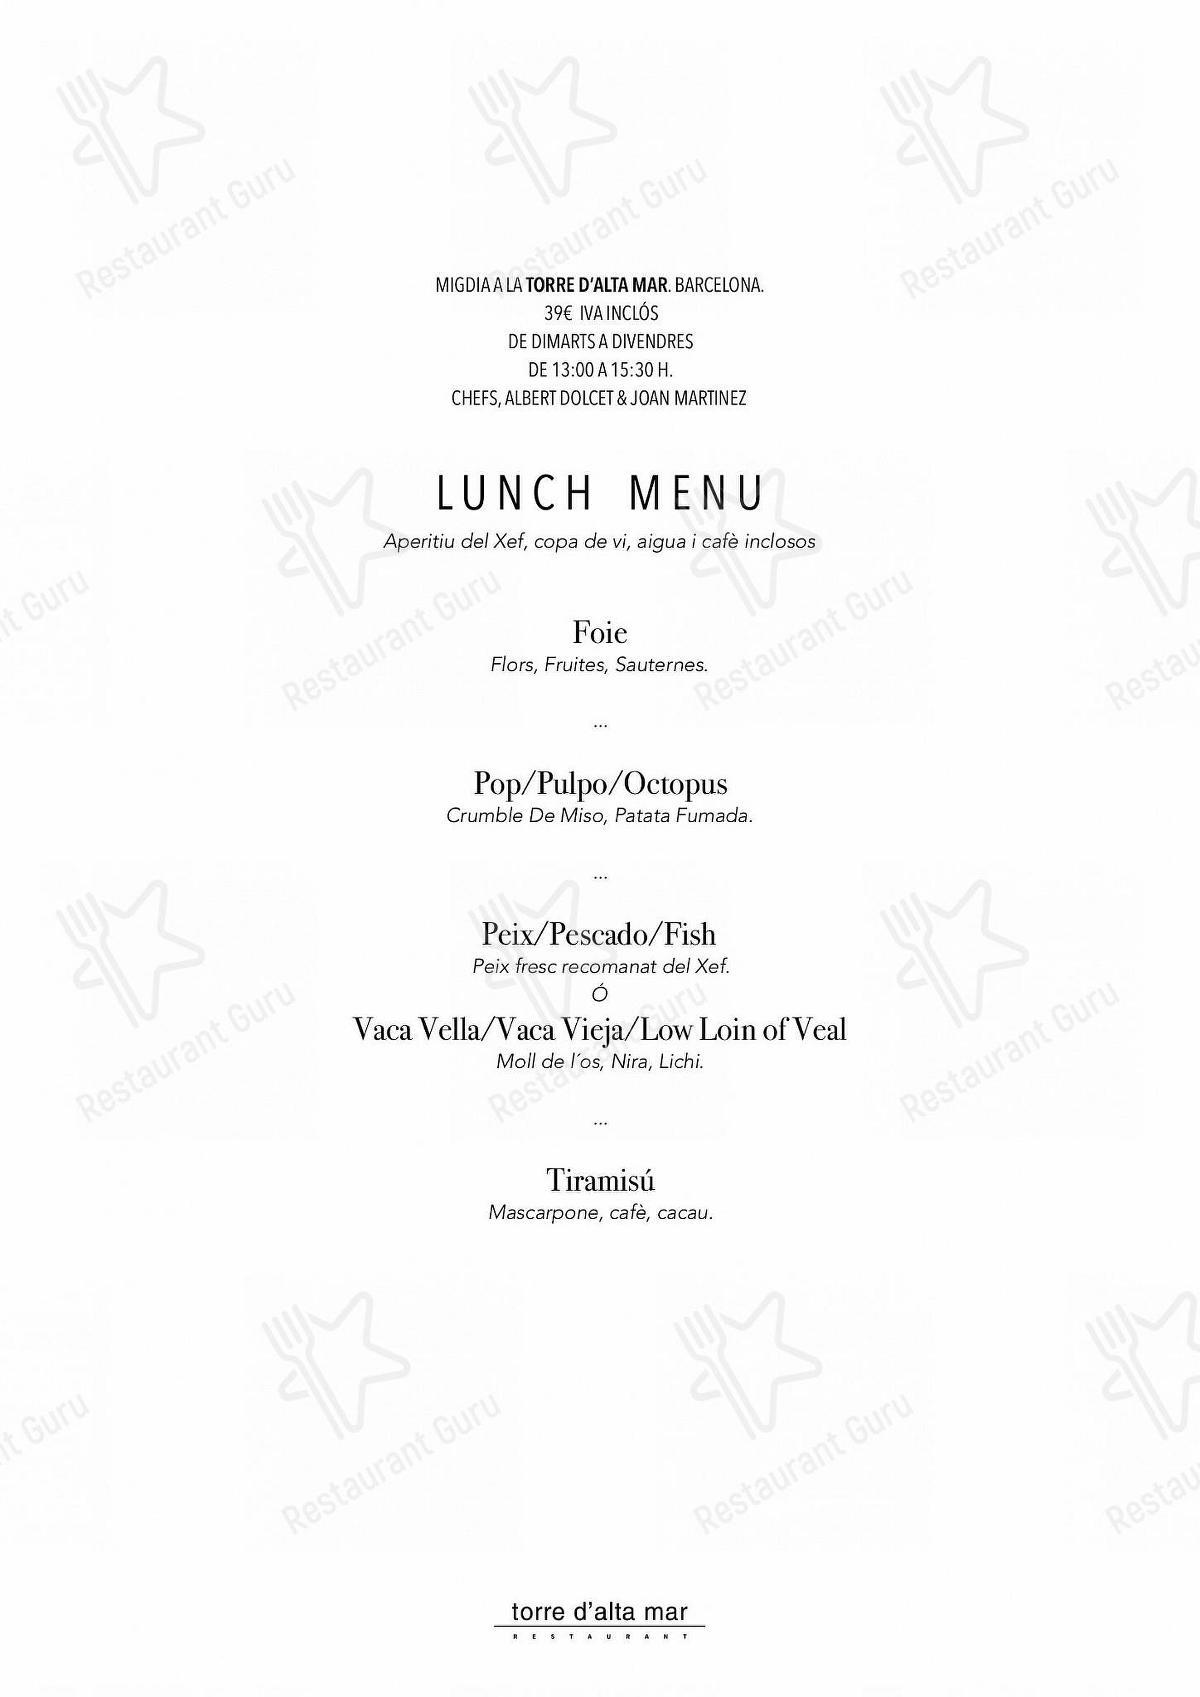 Torre d'Alta Mar menu - meals and drinks